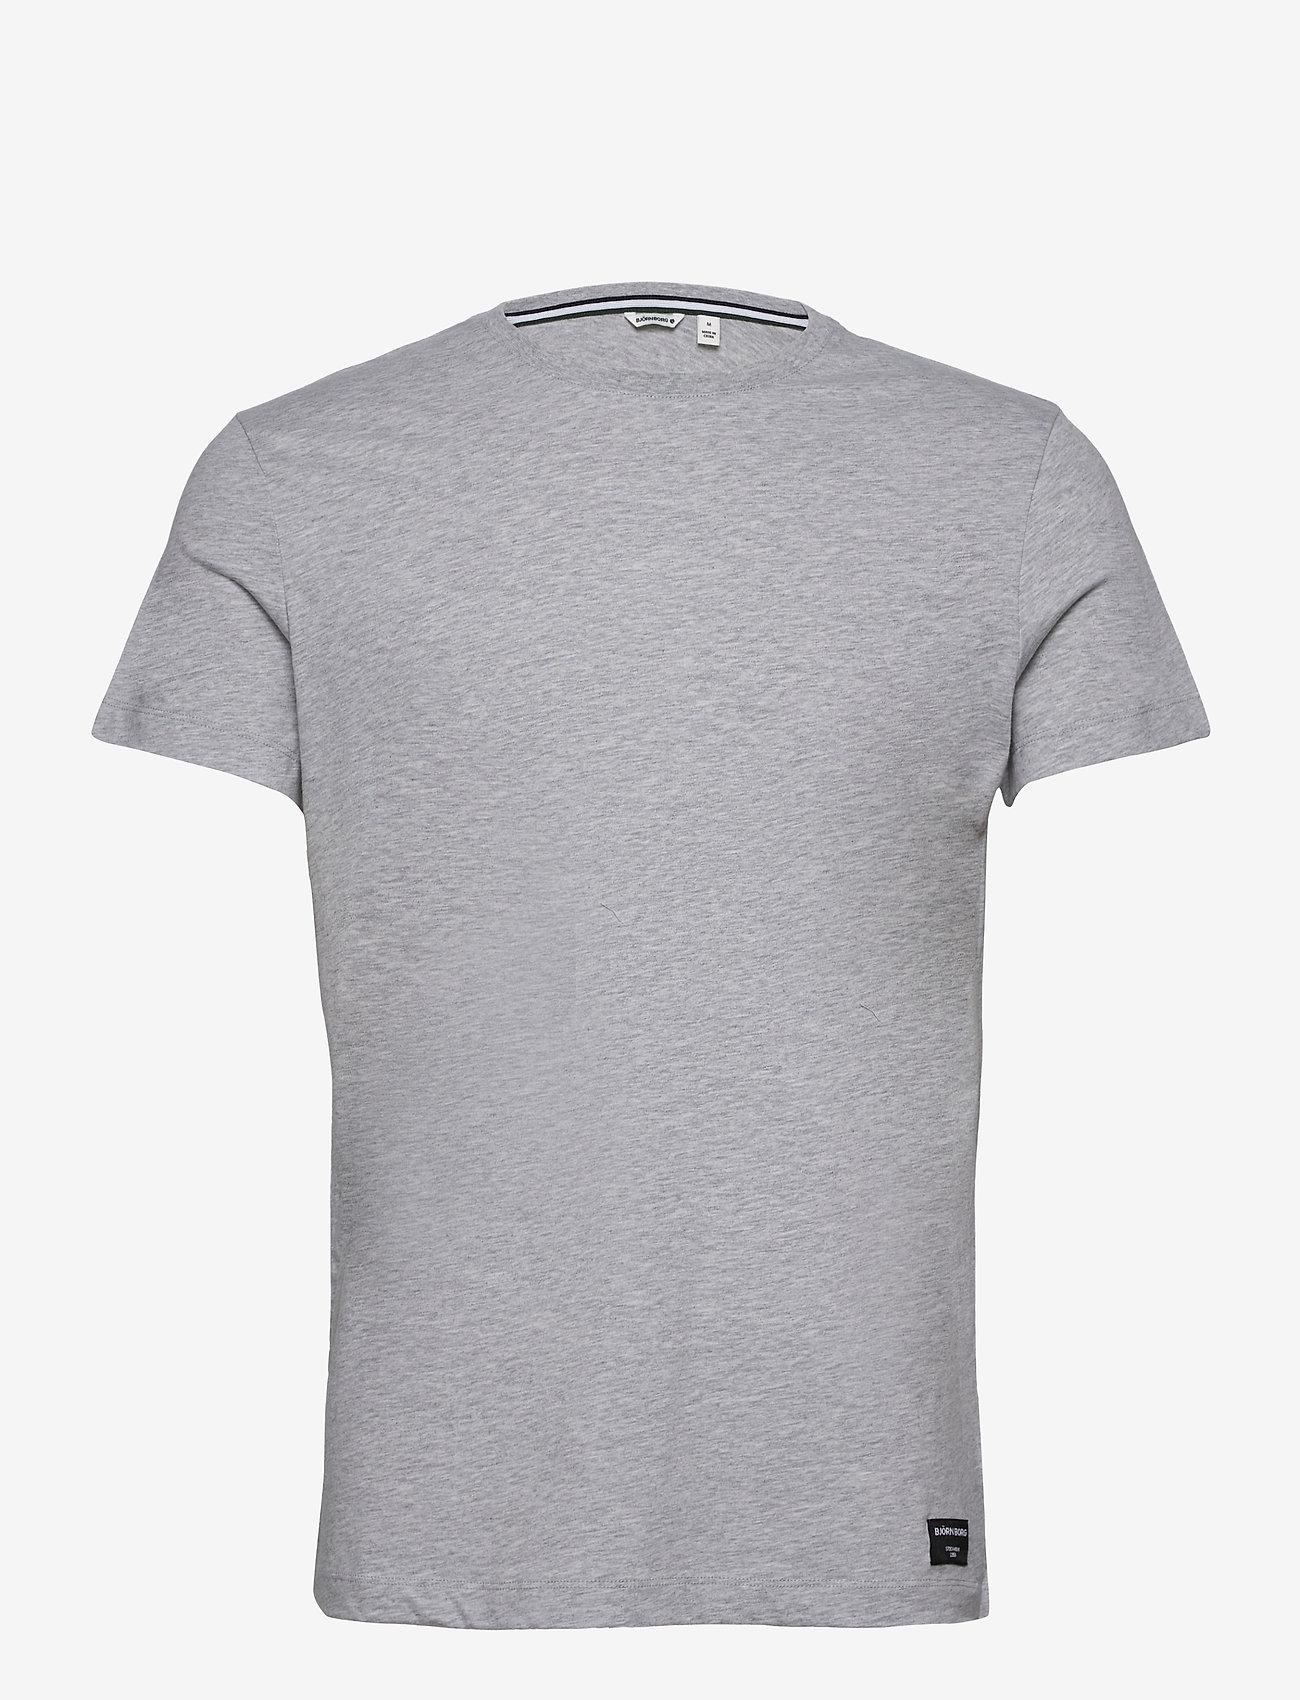 Björn Borg - TEE CENTRE CENTRE - basic t-shirts - h108by light grey melange - 0